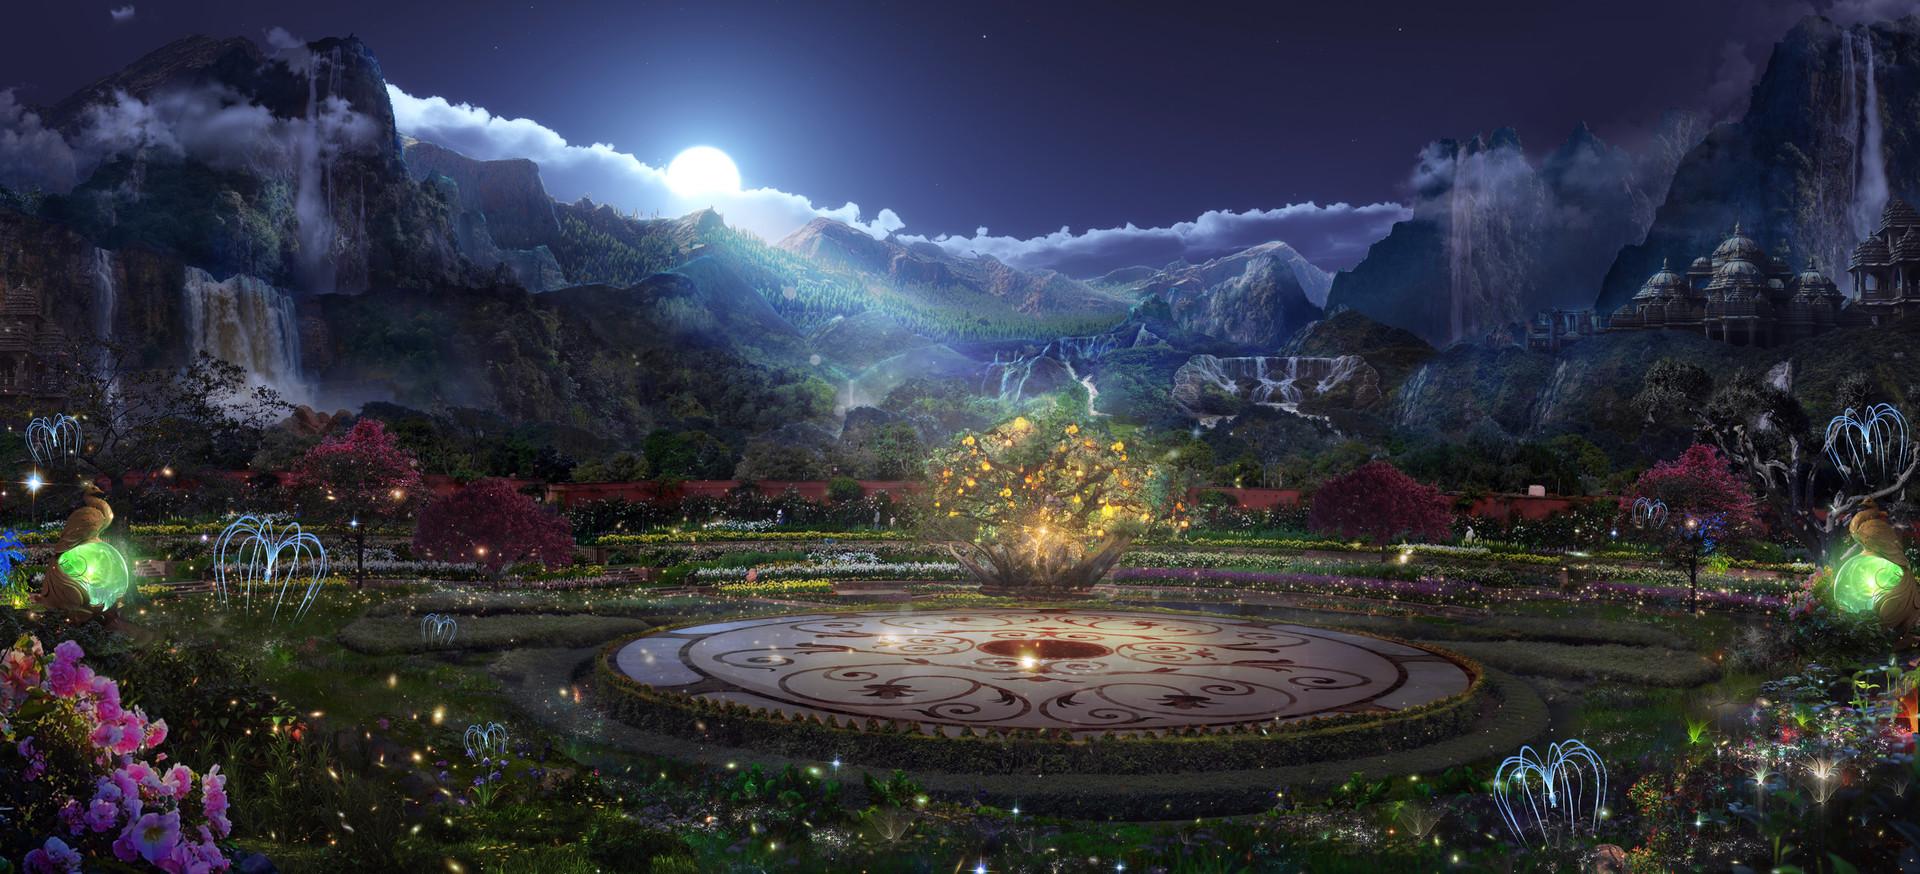 Vaibhav Thakur Fantasy Garden